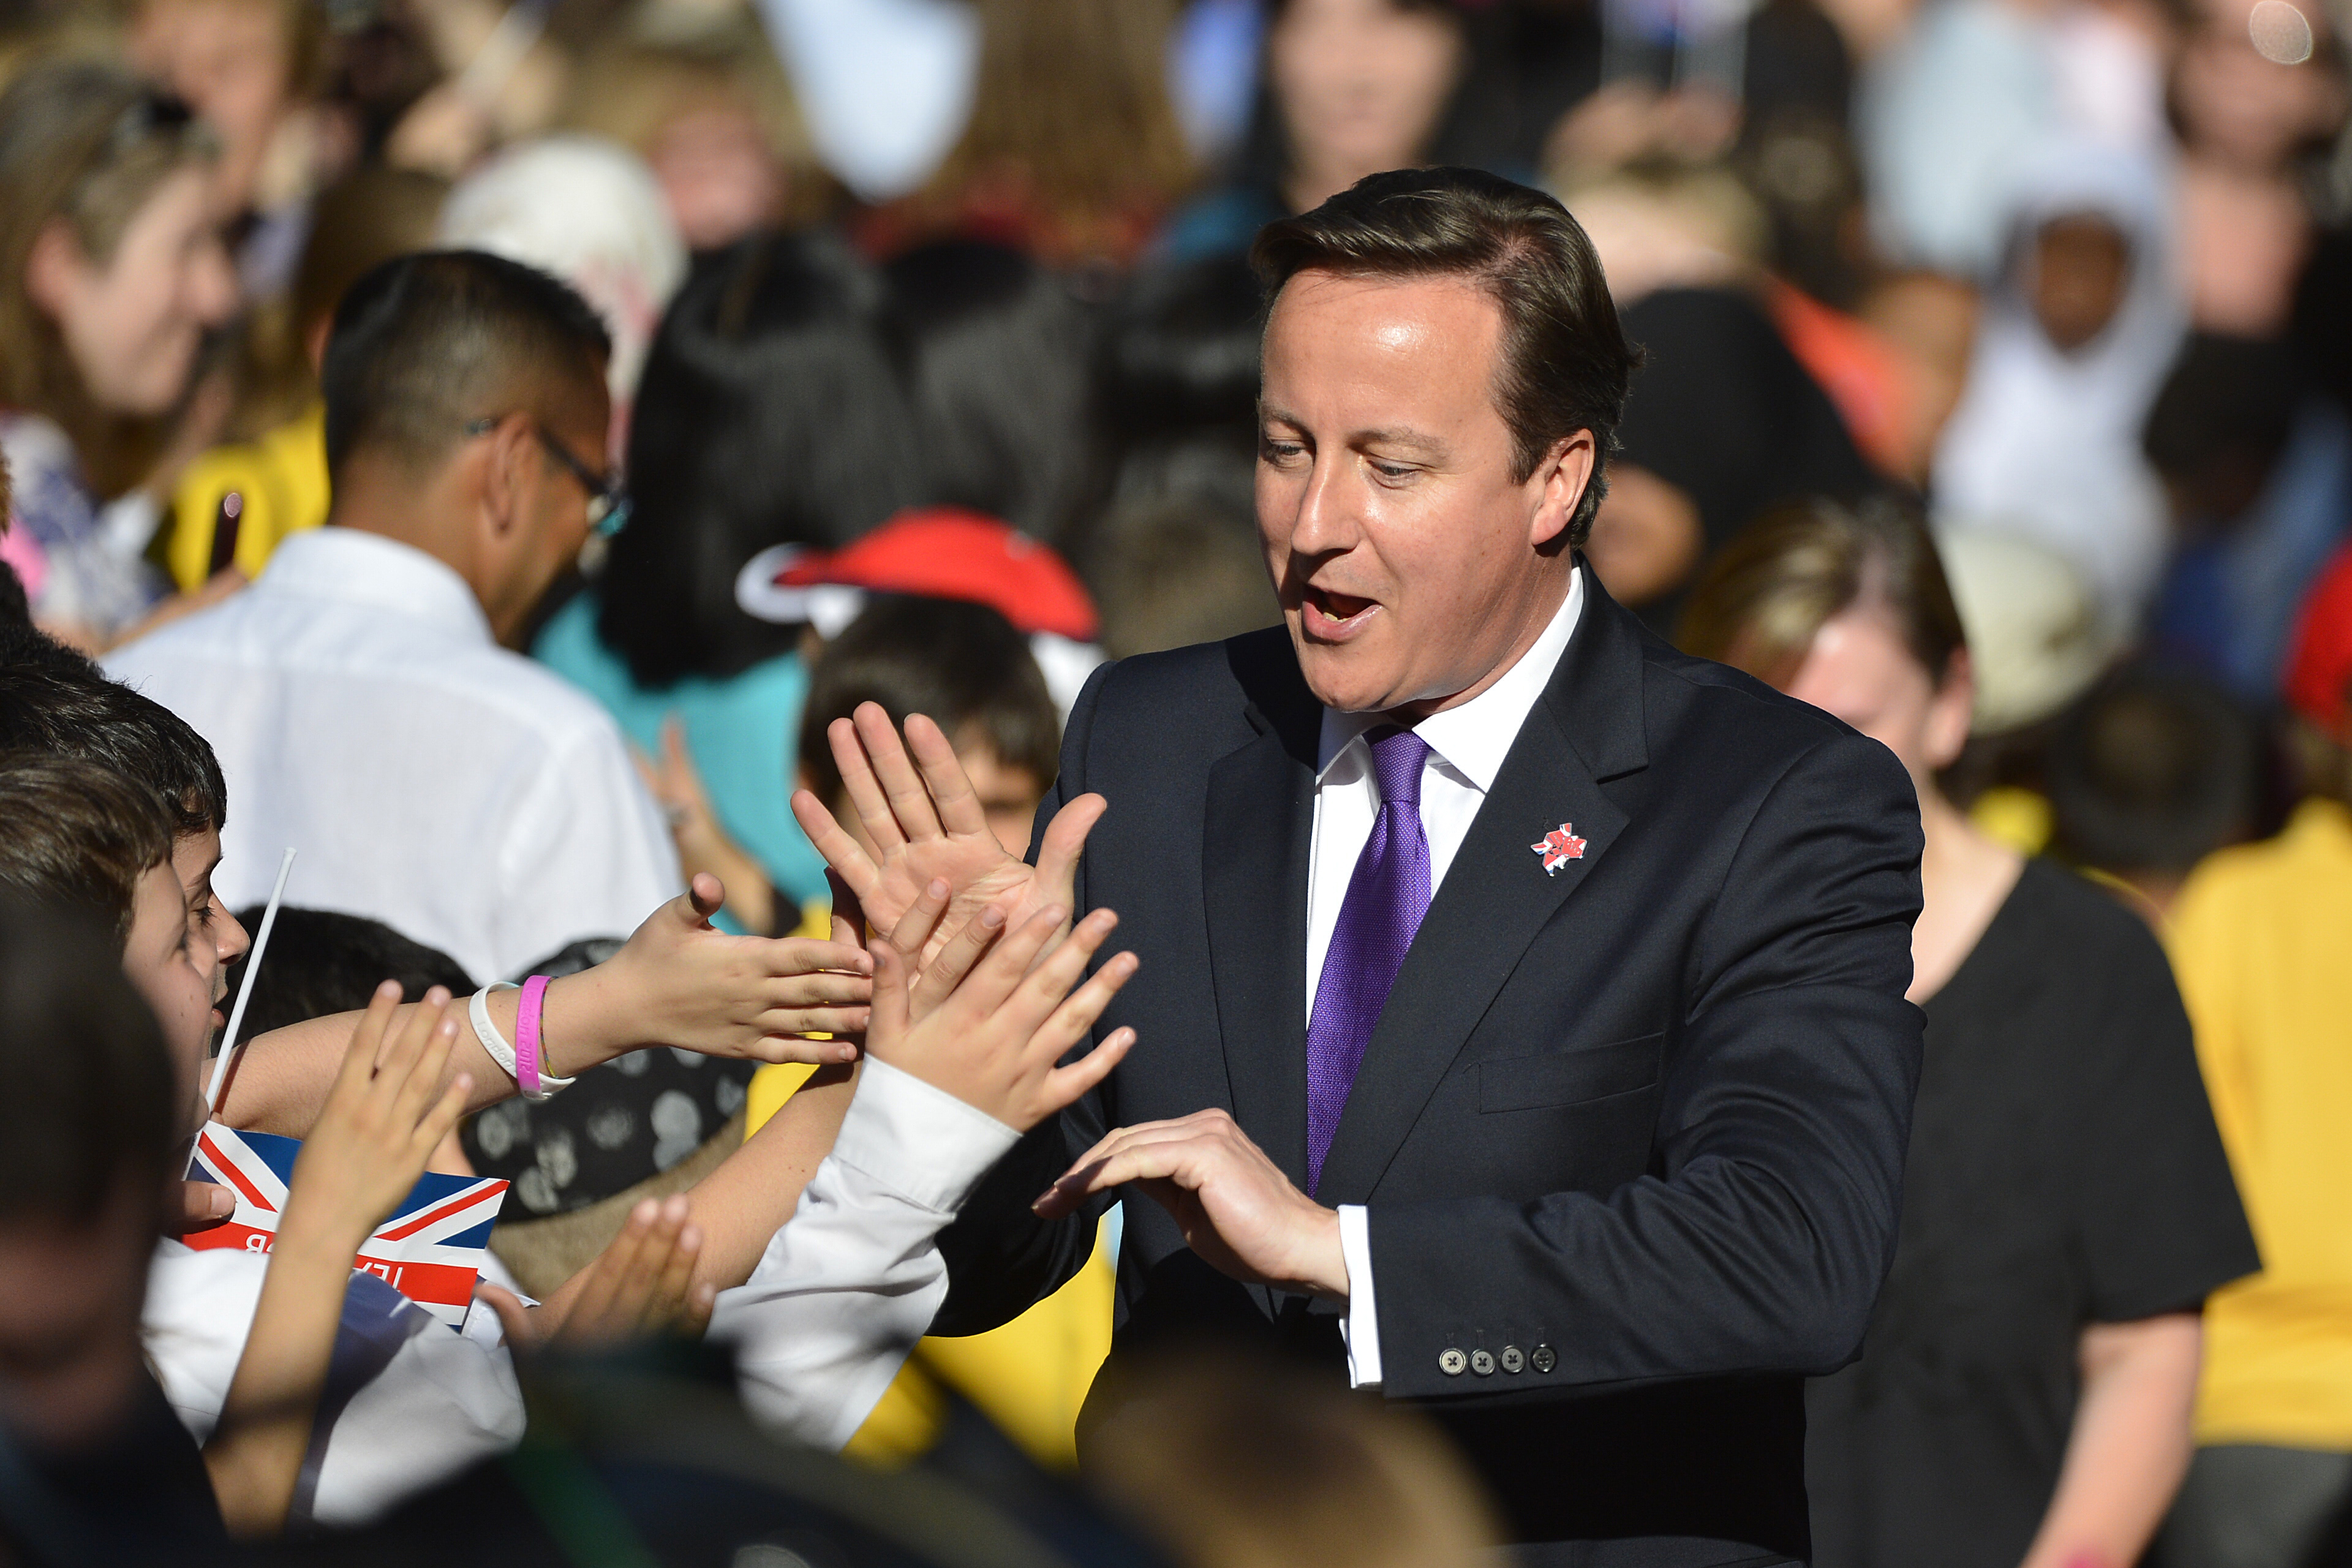 Дэвид Кэмерон: Контрацепция спасла меня от хаоса